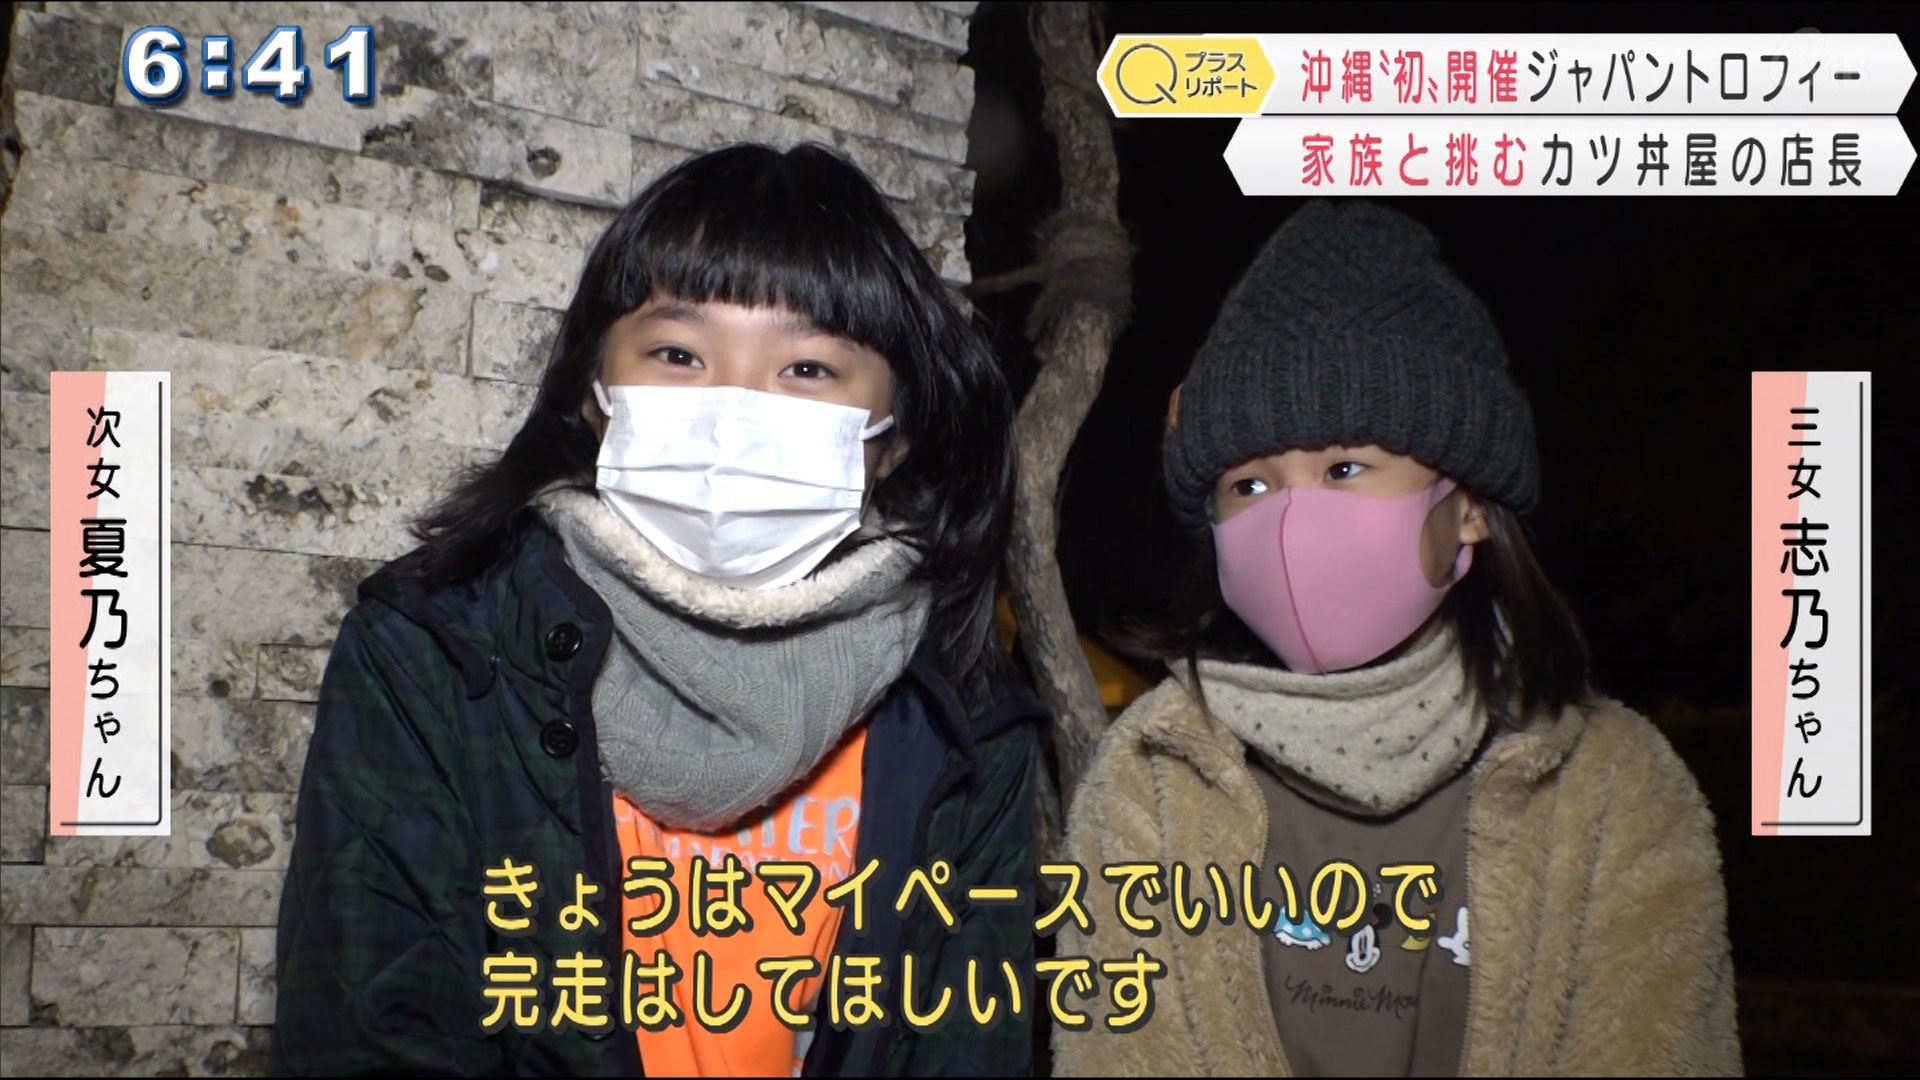 JapanTrophy200 カツ丼屋店長の200キロ